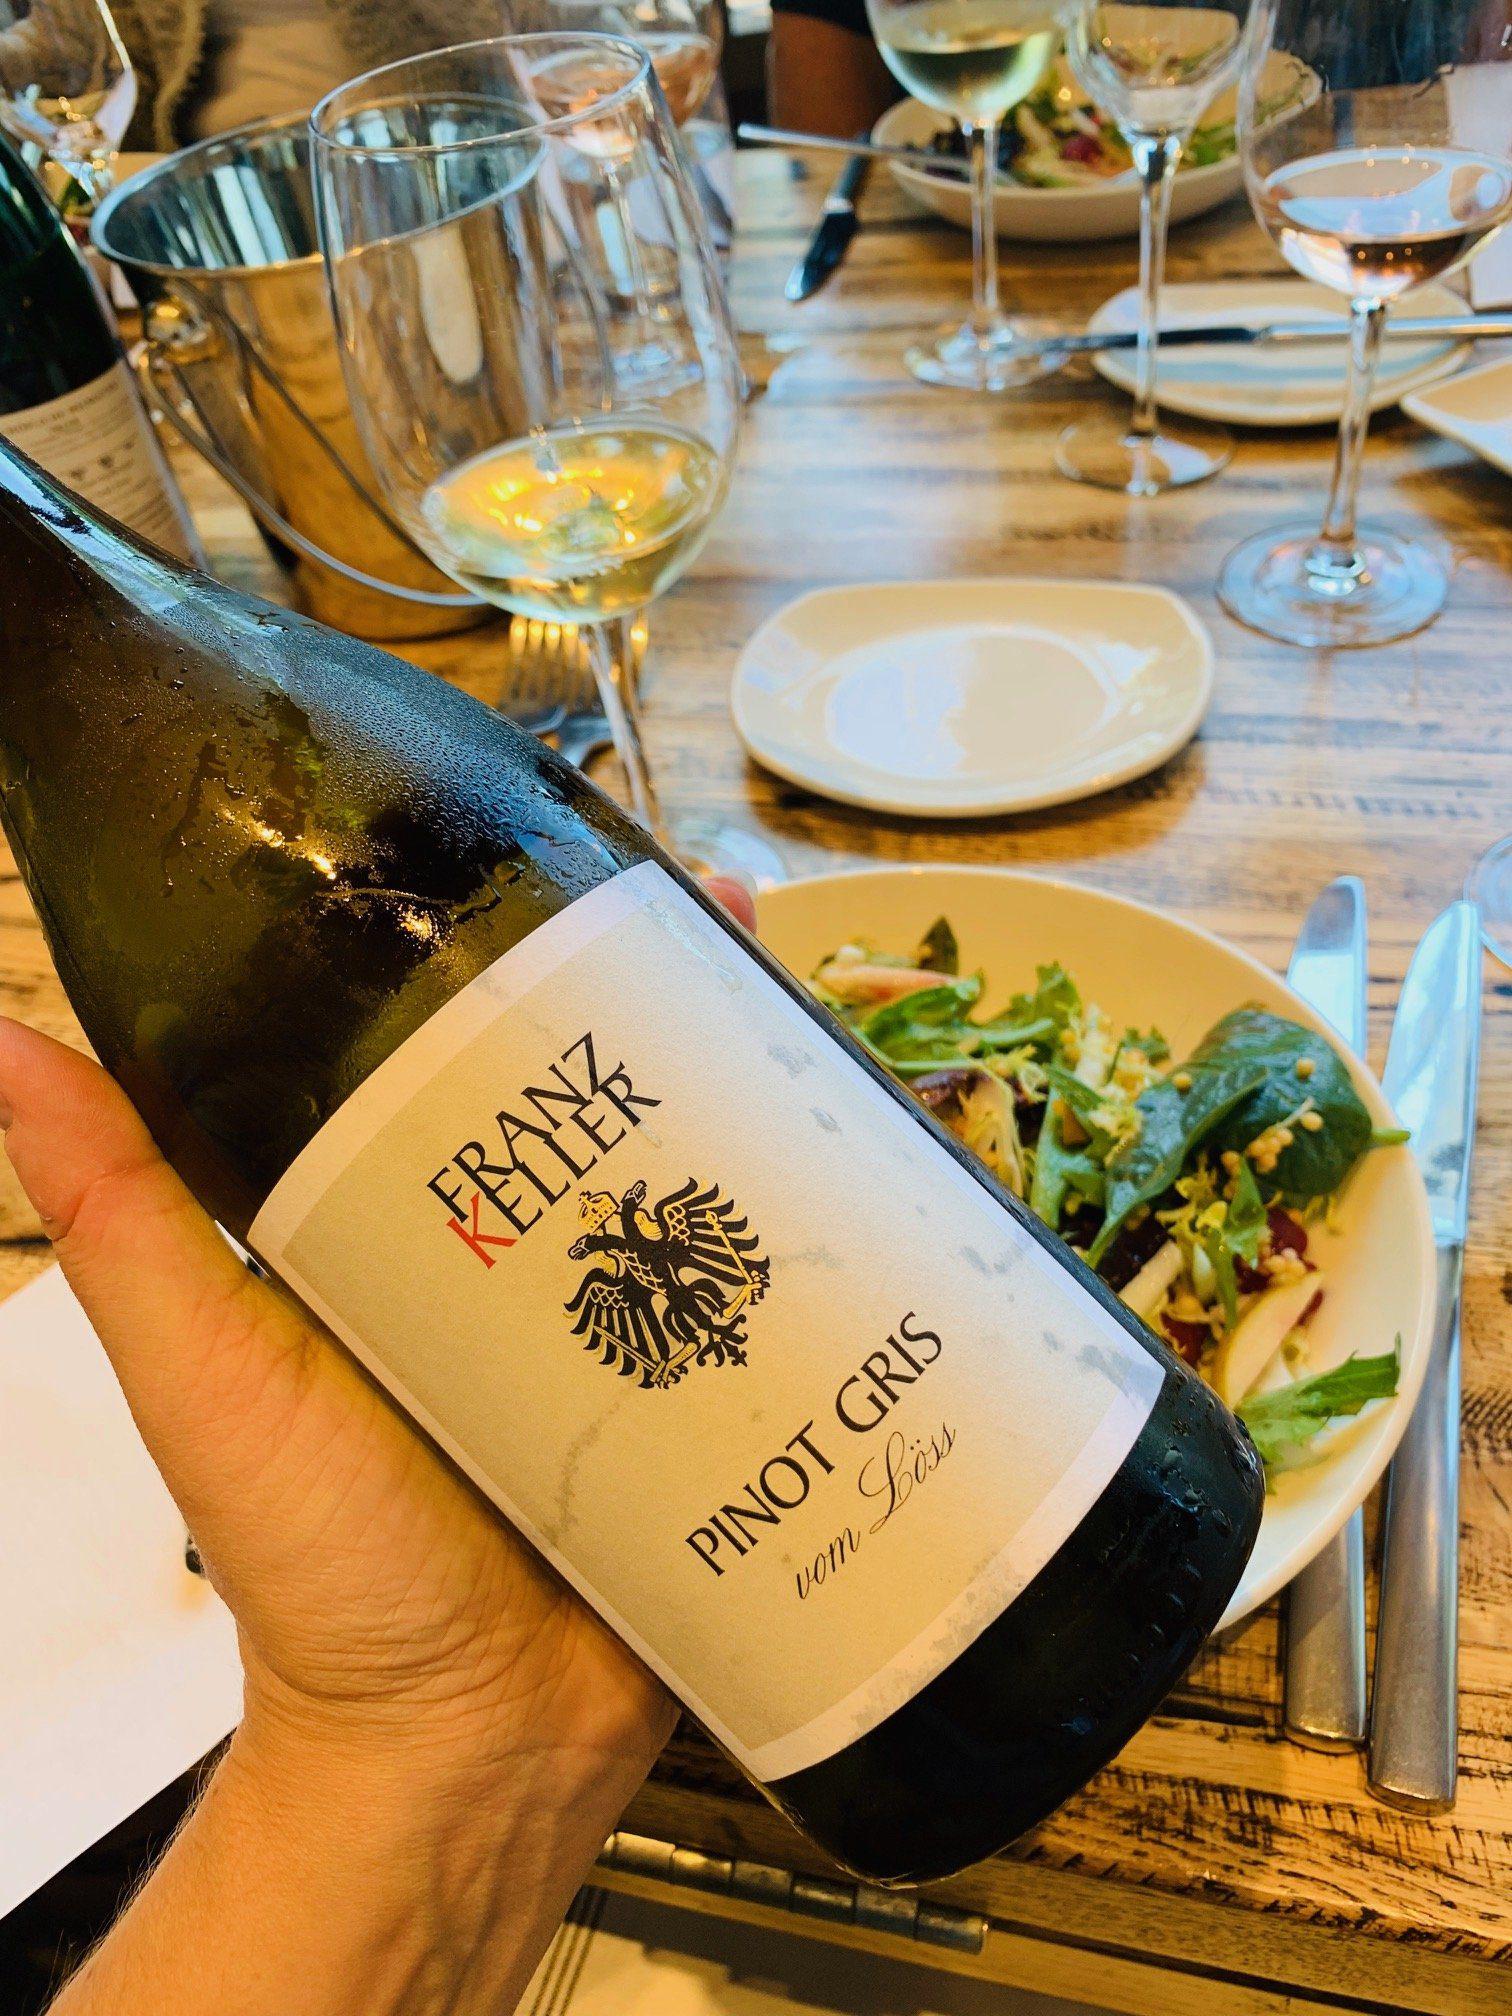 2017 Franz Keller Vom Löss Pinot Gris, Baden